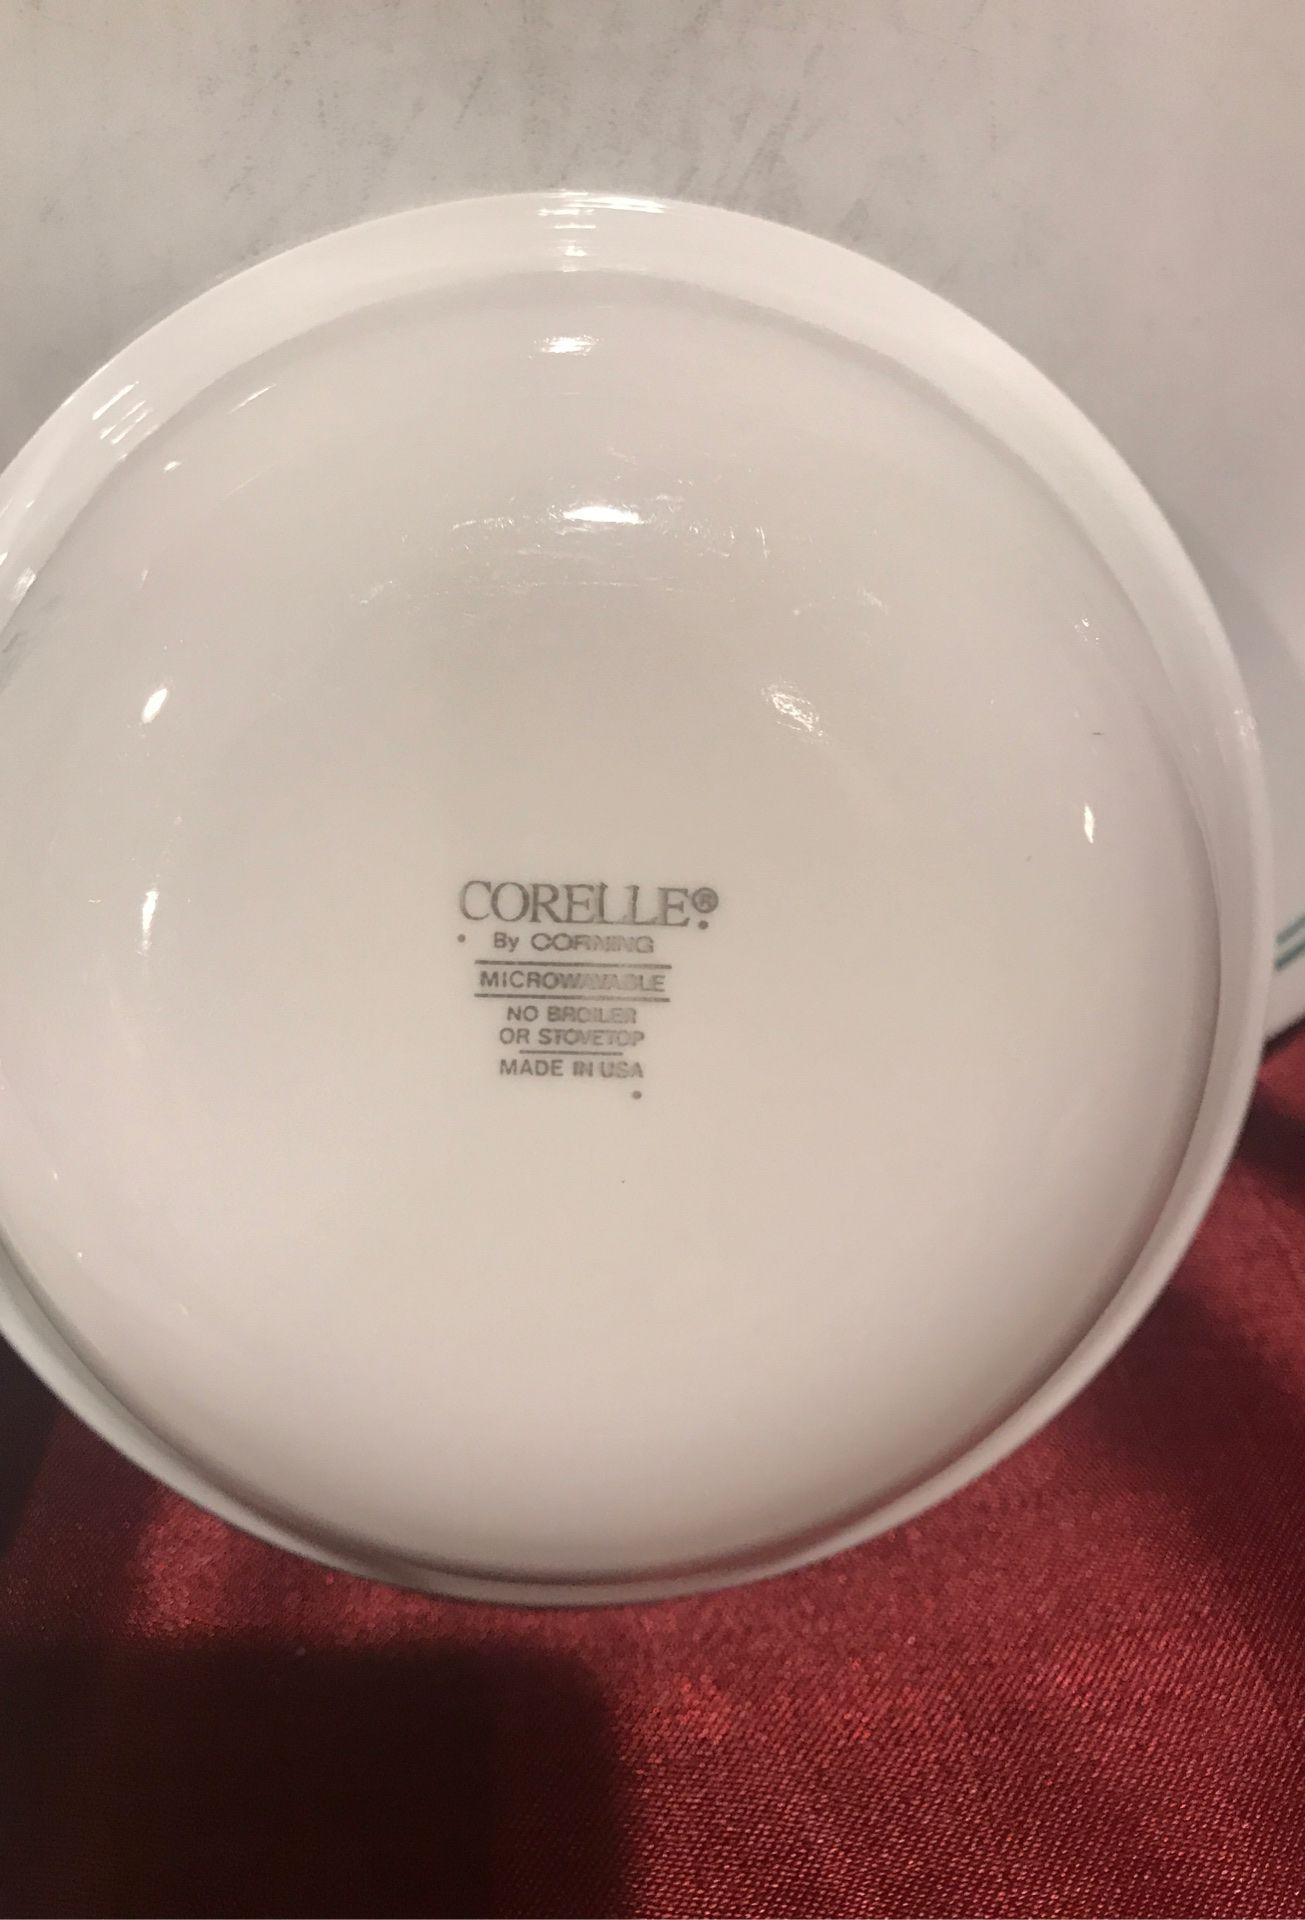 Corelle Dinnerware service for 4